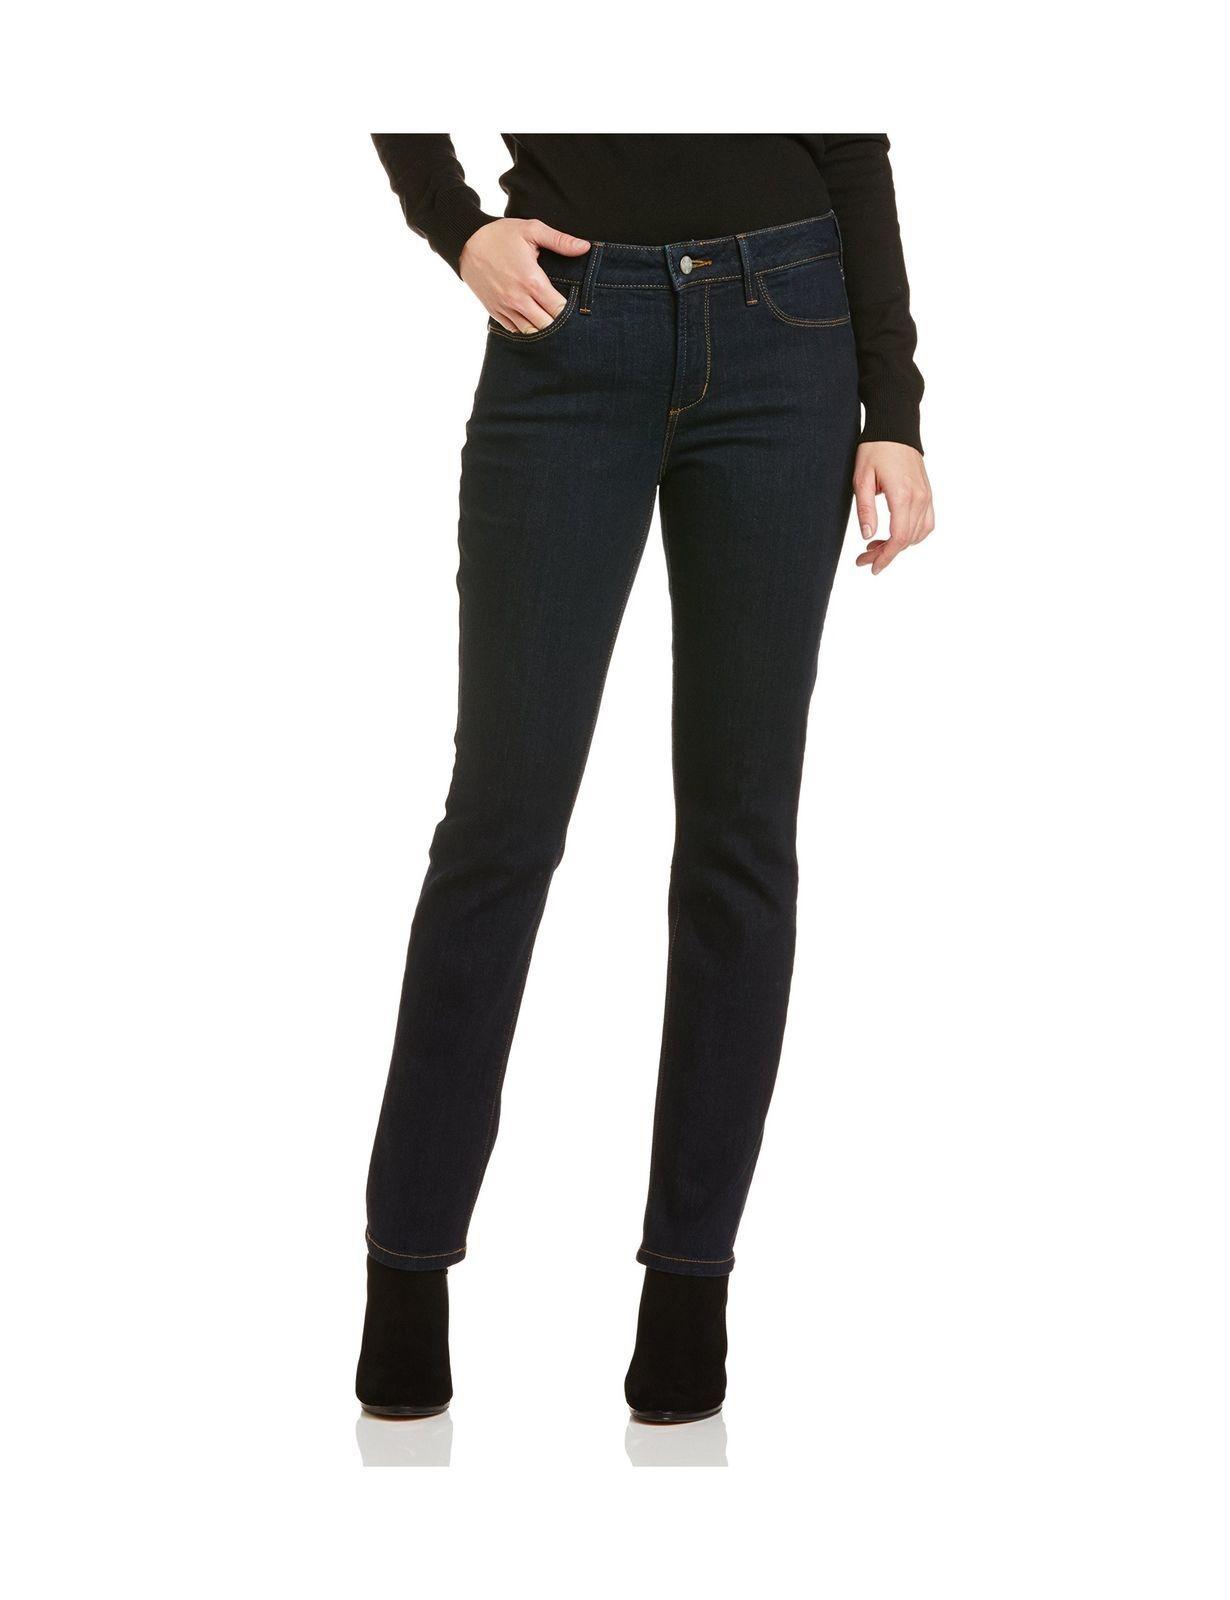 NYDJ Women P95C60LT Skinny Jeans bluee Dark Denim Size 16   32x28  RRP